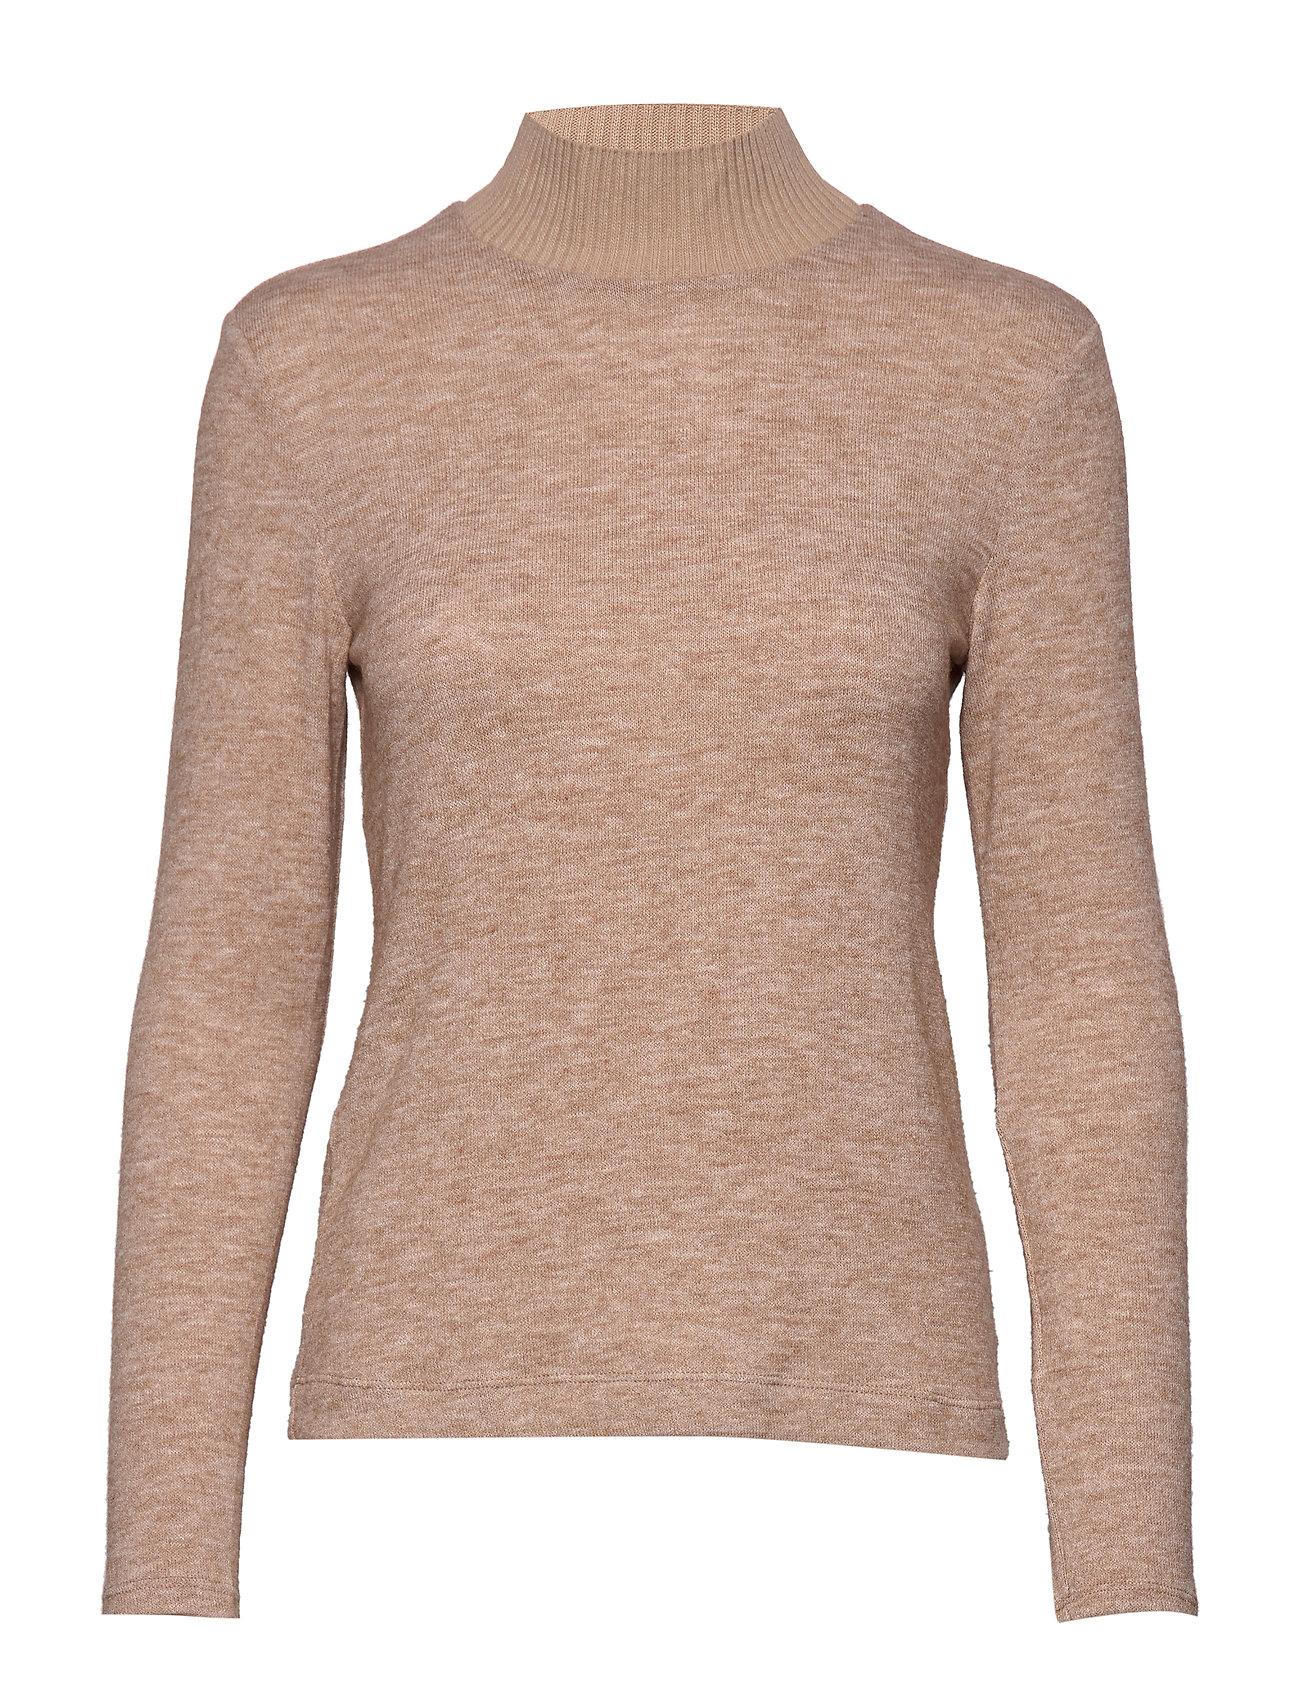 Mango Ribbed knit sweater - LT PASTEL BROWN